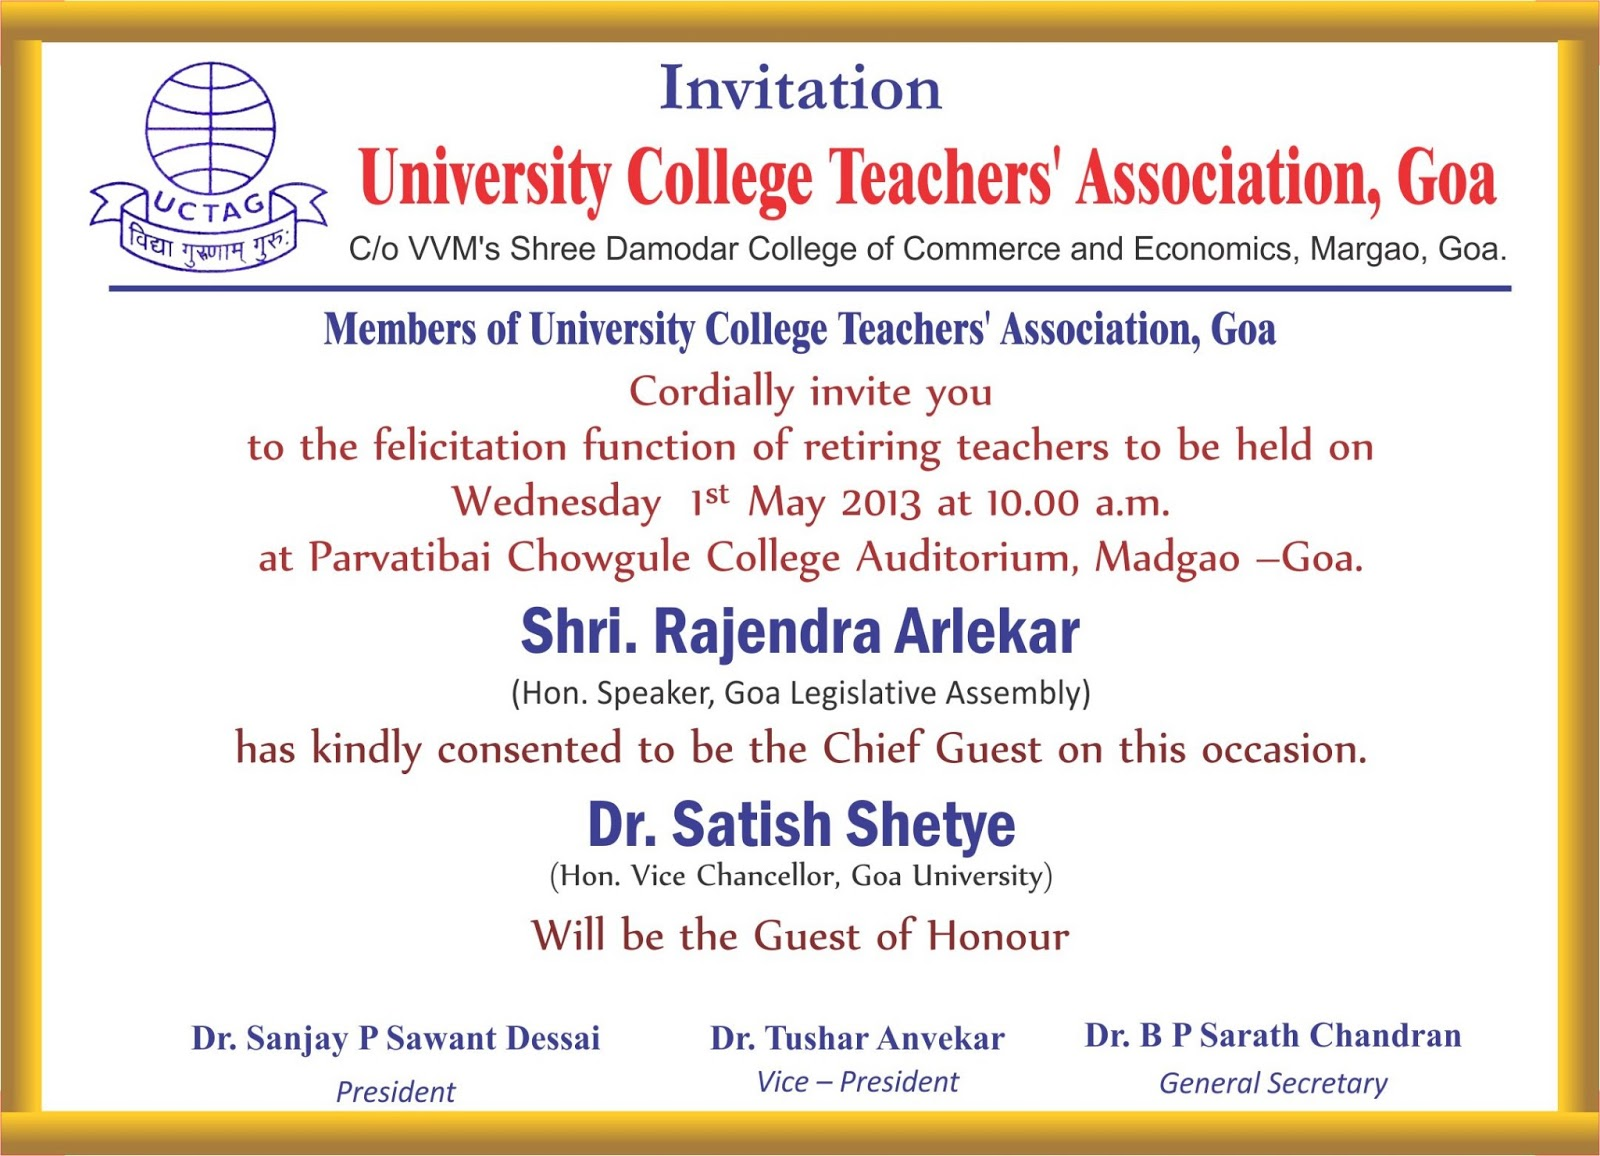 Felicitation function of retiring teachers to be held on Wednesday